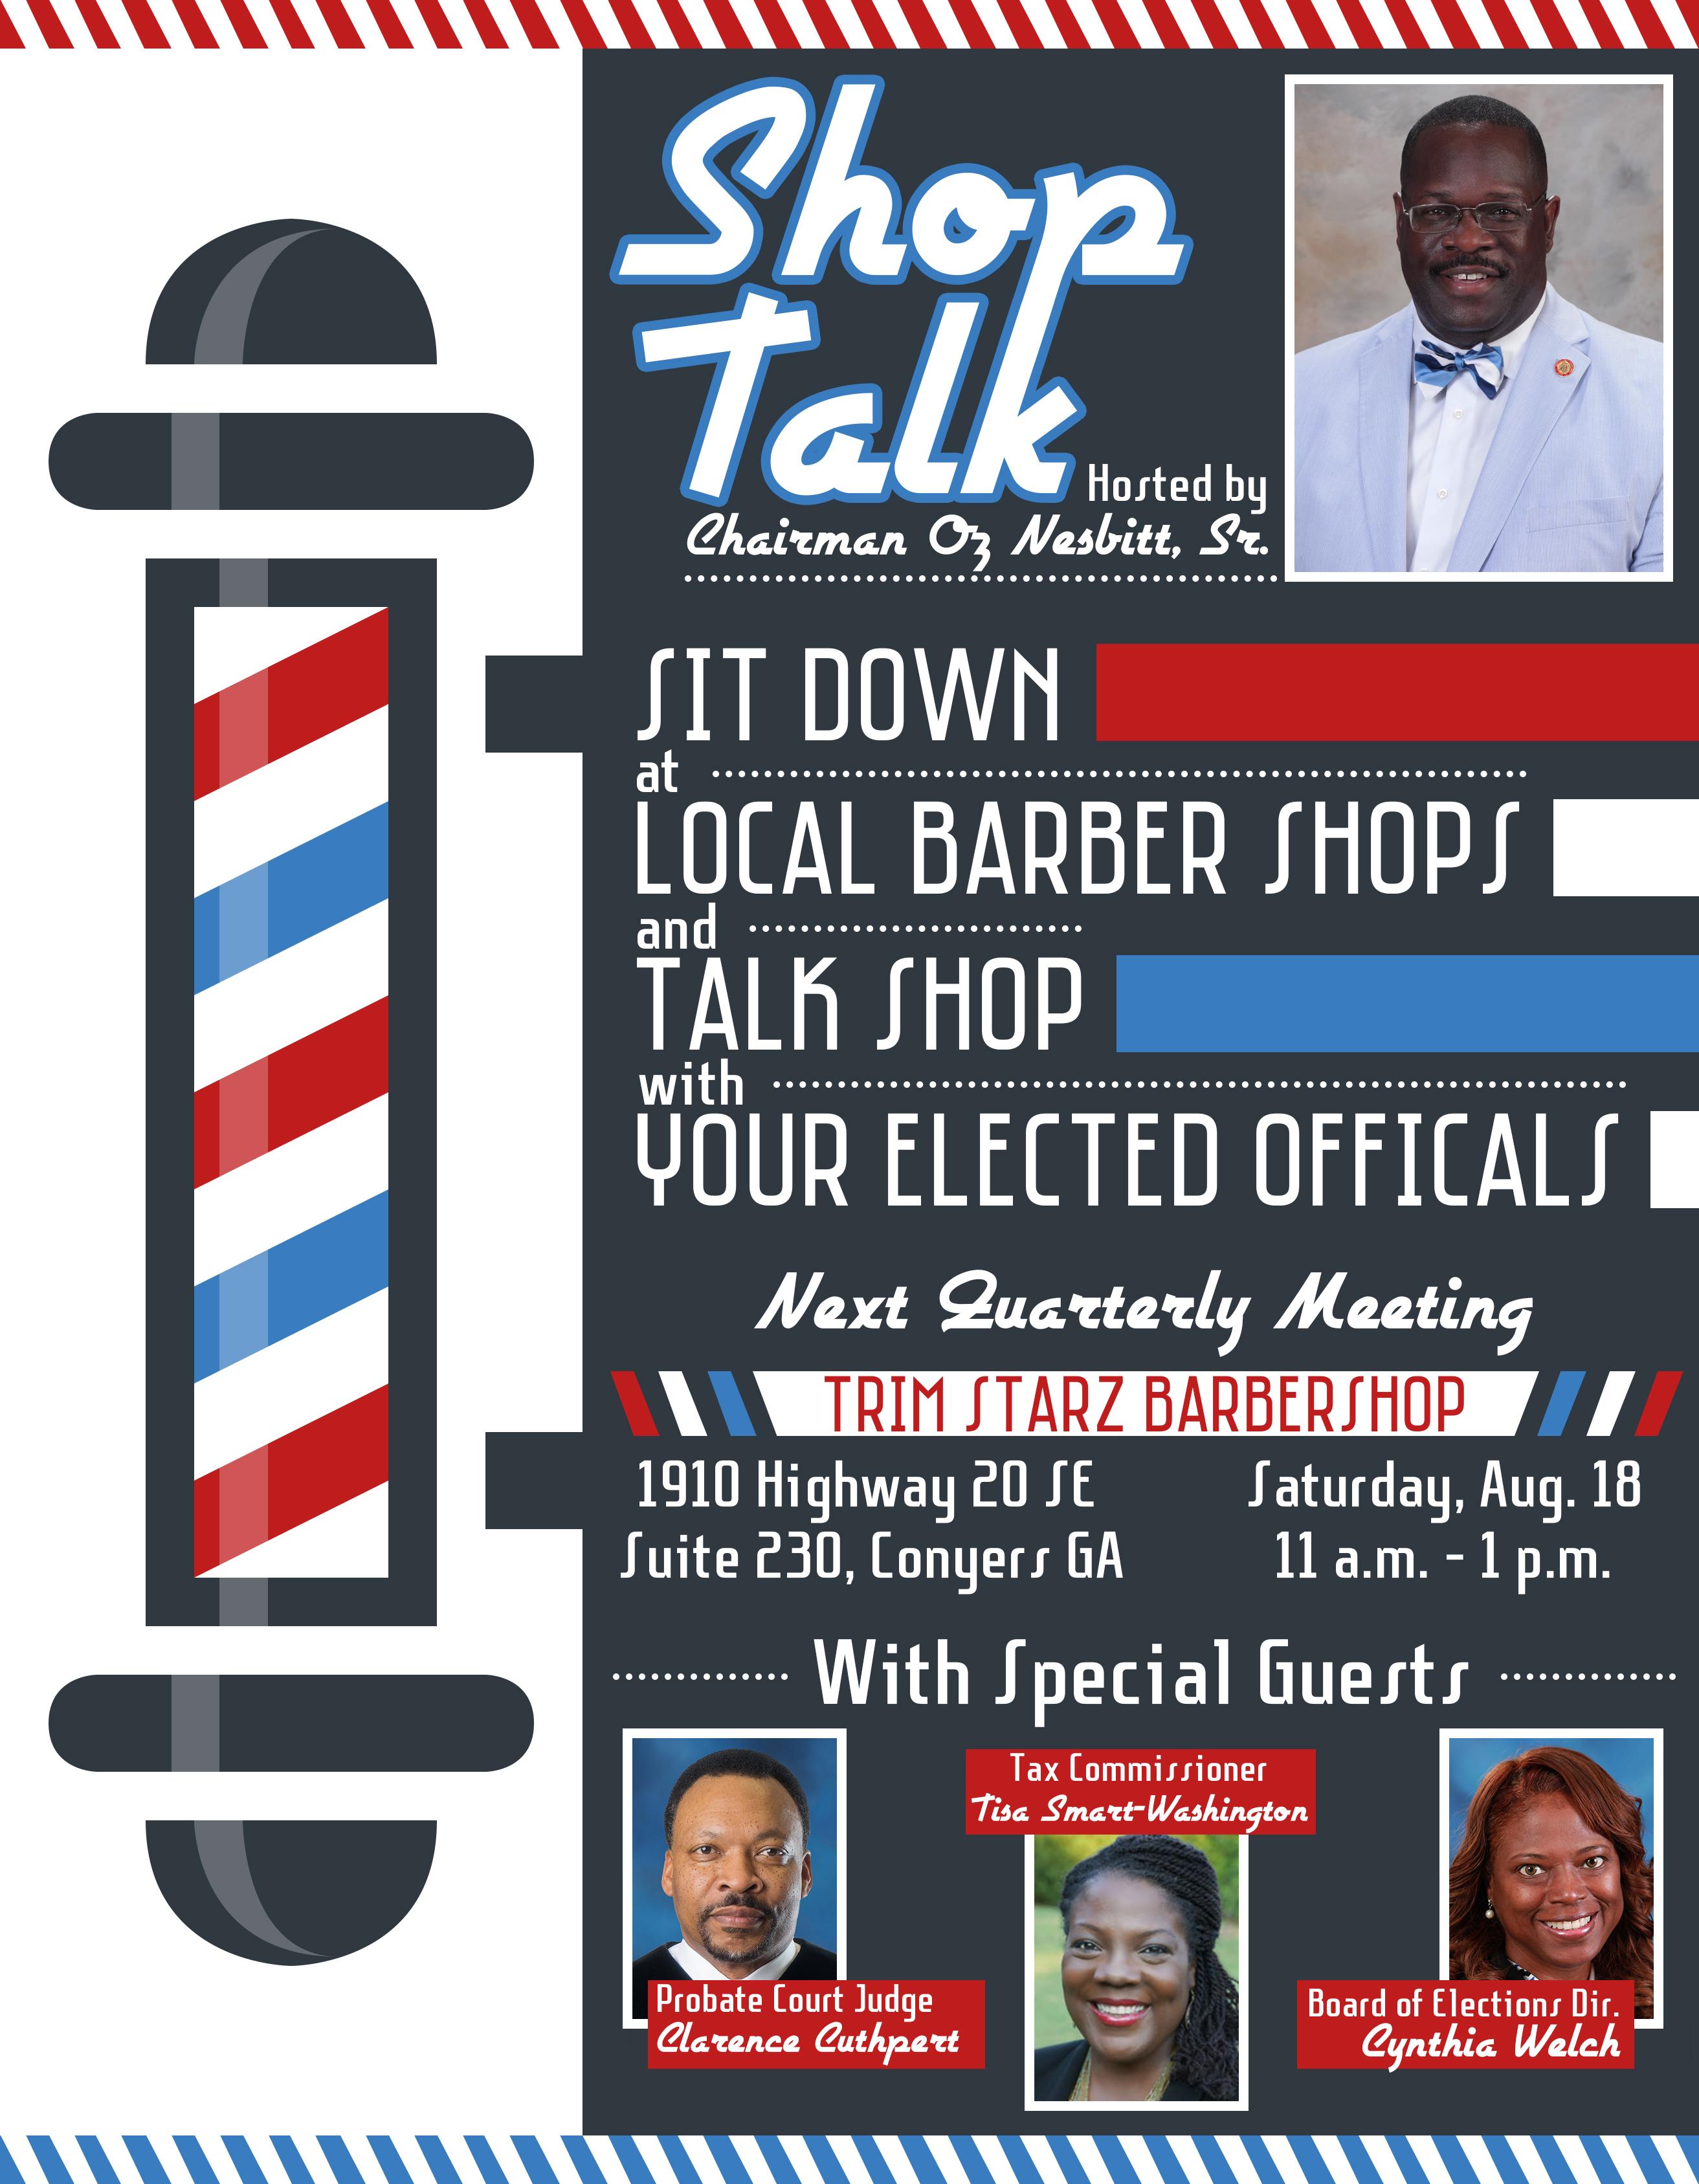 Shop Talk 3 @ Trim Starz Barber Shop